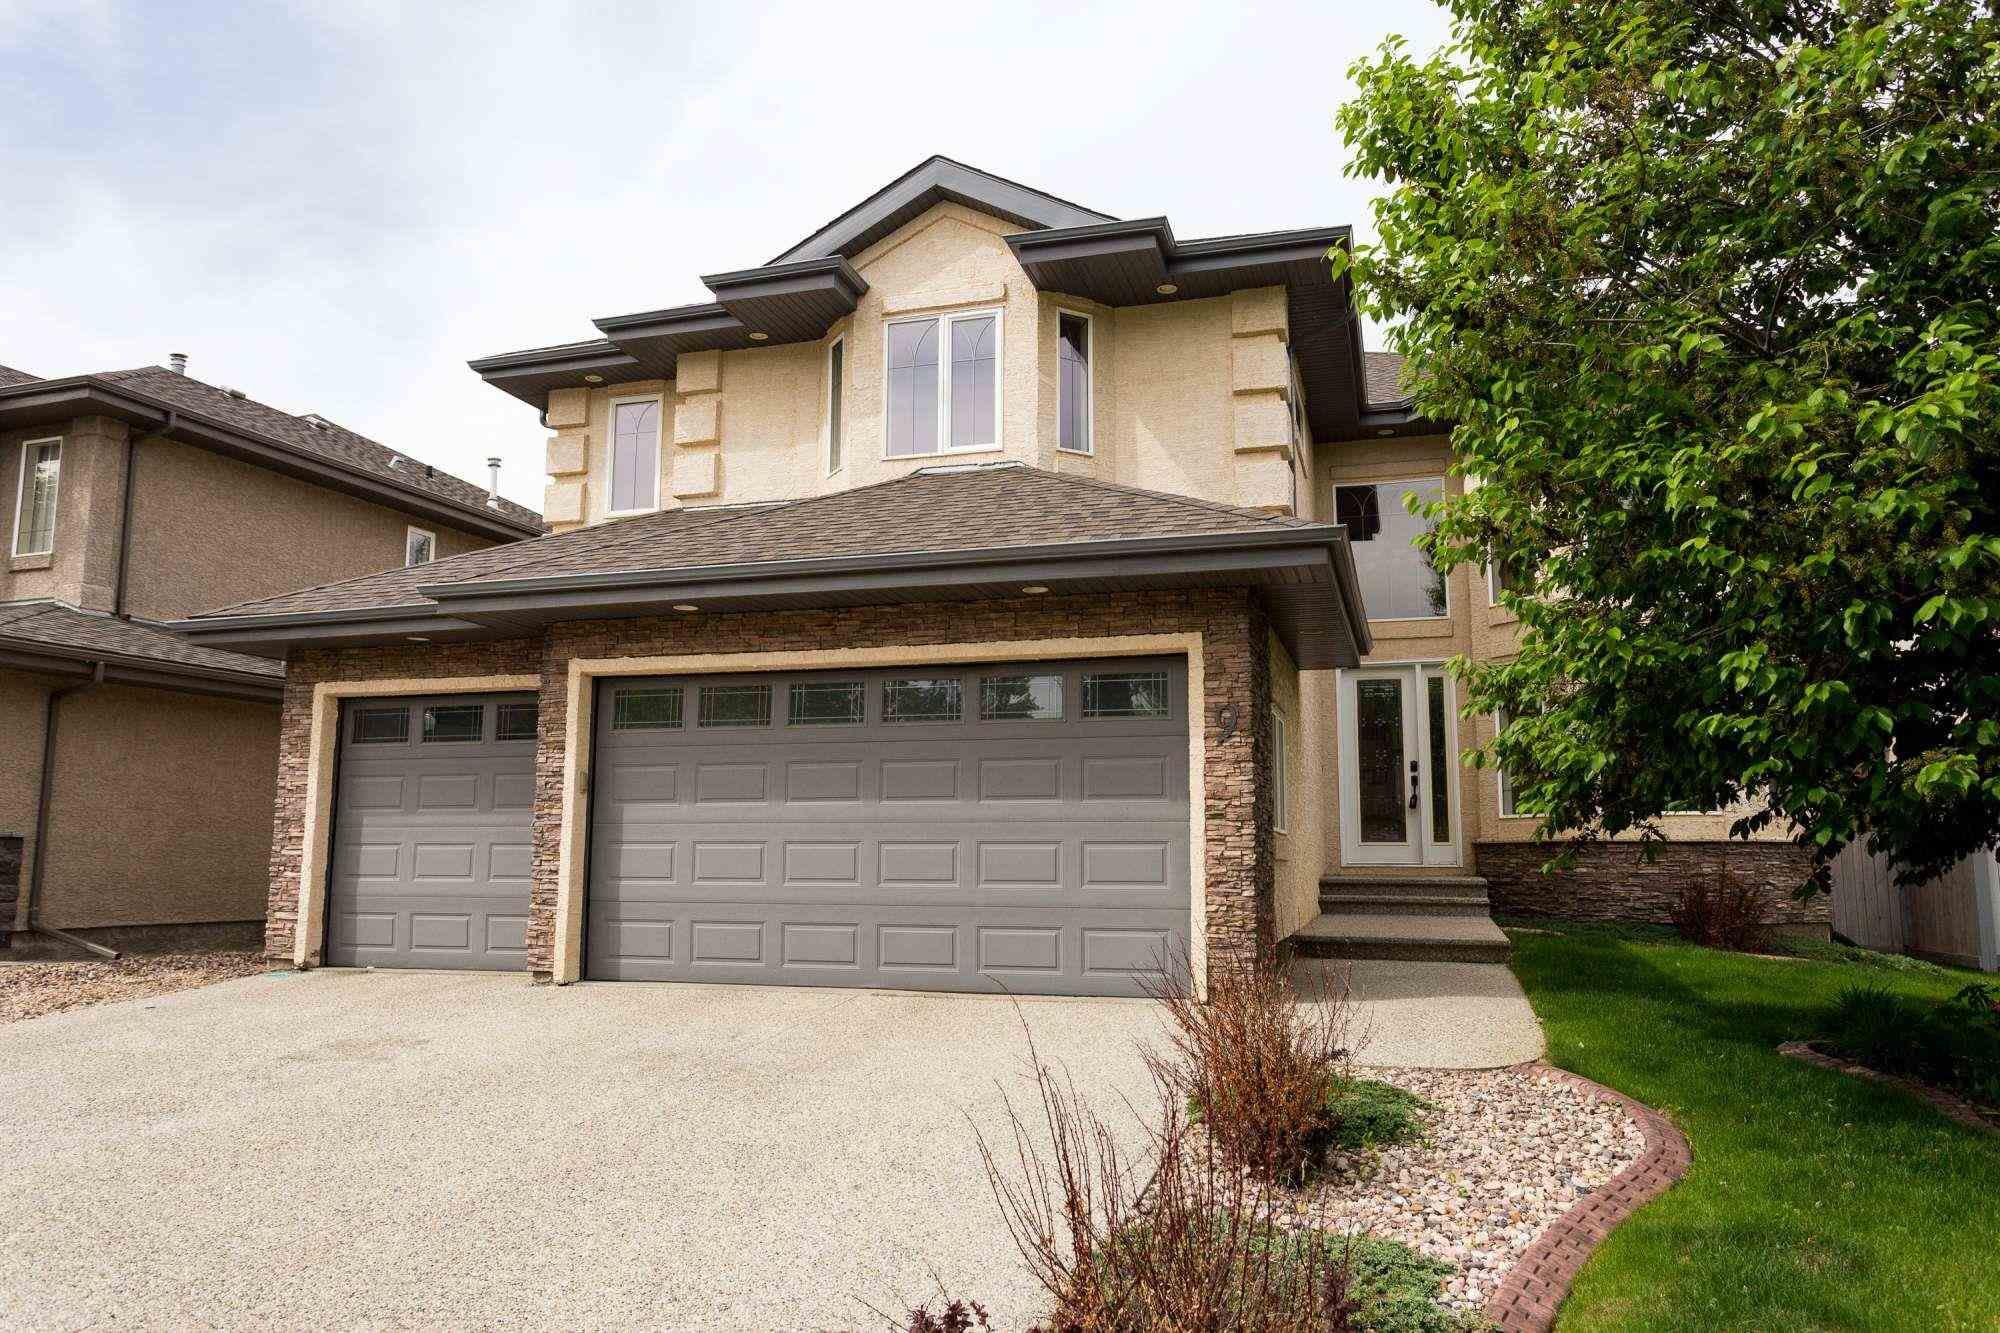 Main Photo: 9 Loiselle Way: St. Albert House for sale : MLS®# E4262065